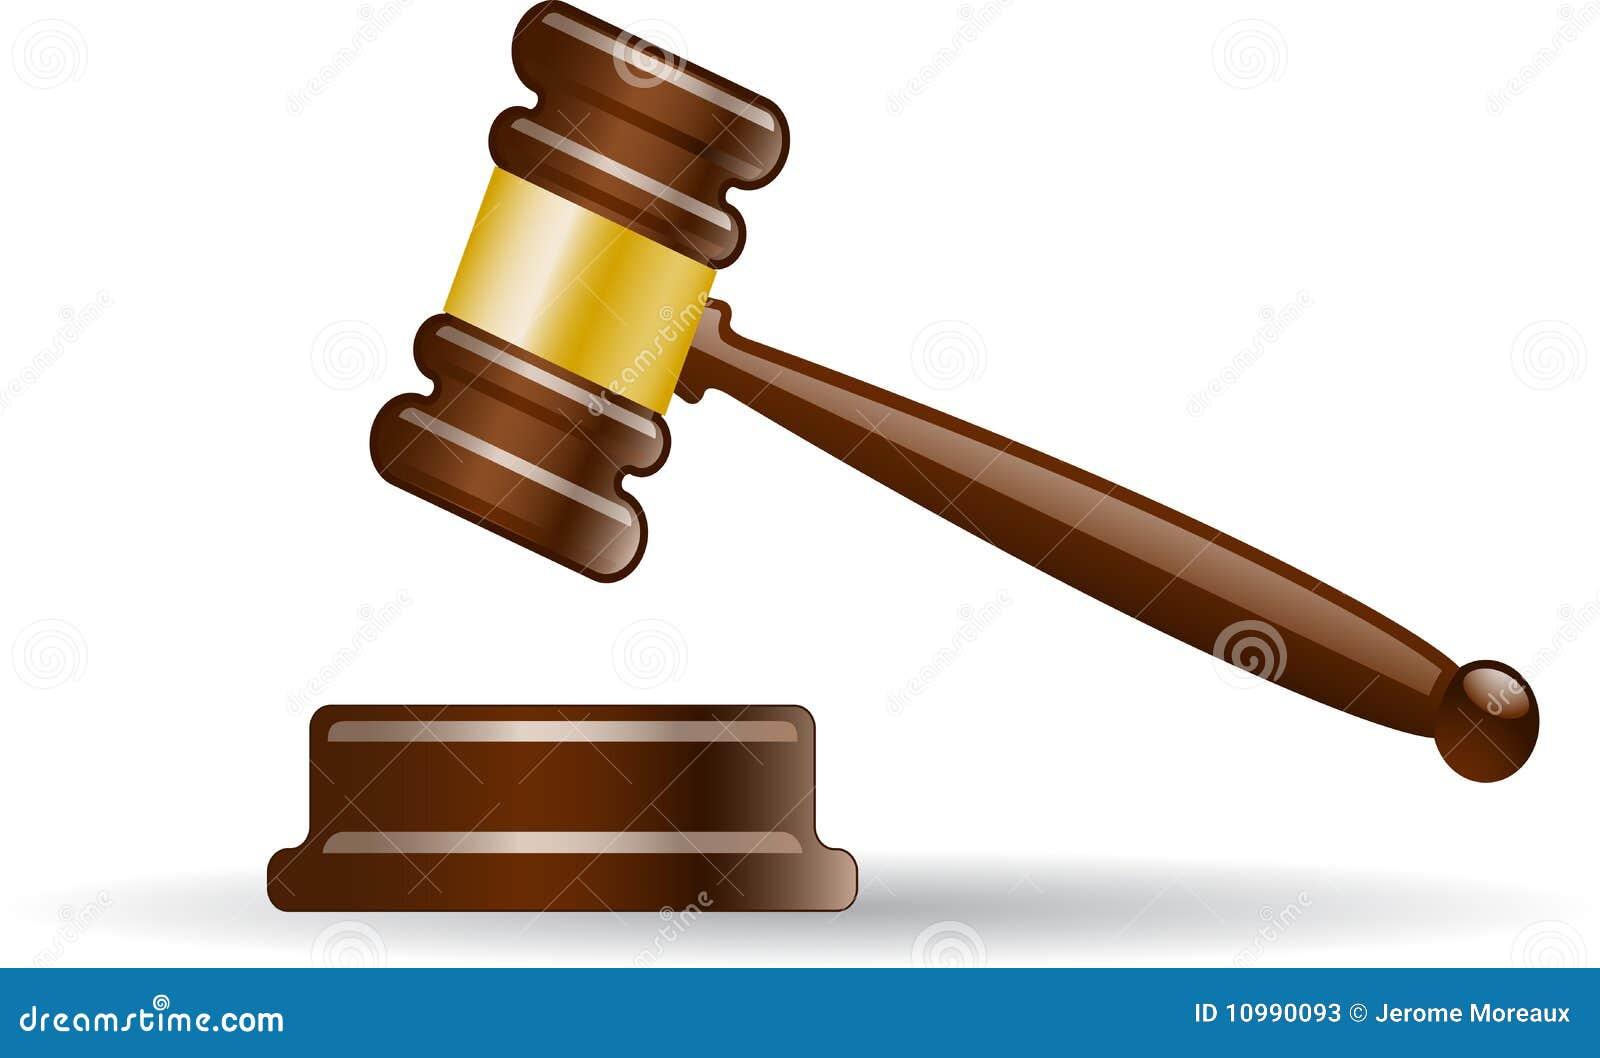 stock photos mallet of judge image 10990093 clip art judge gavel clip art judges needed